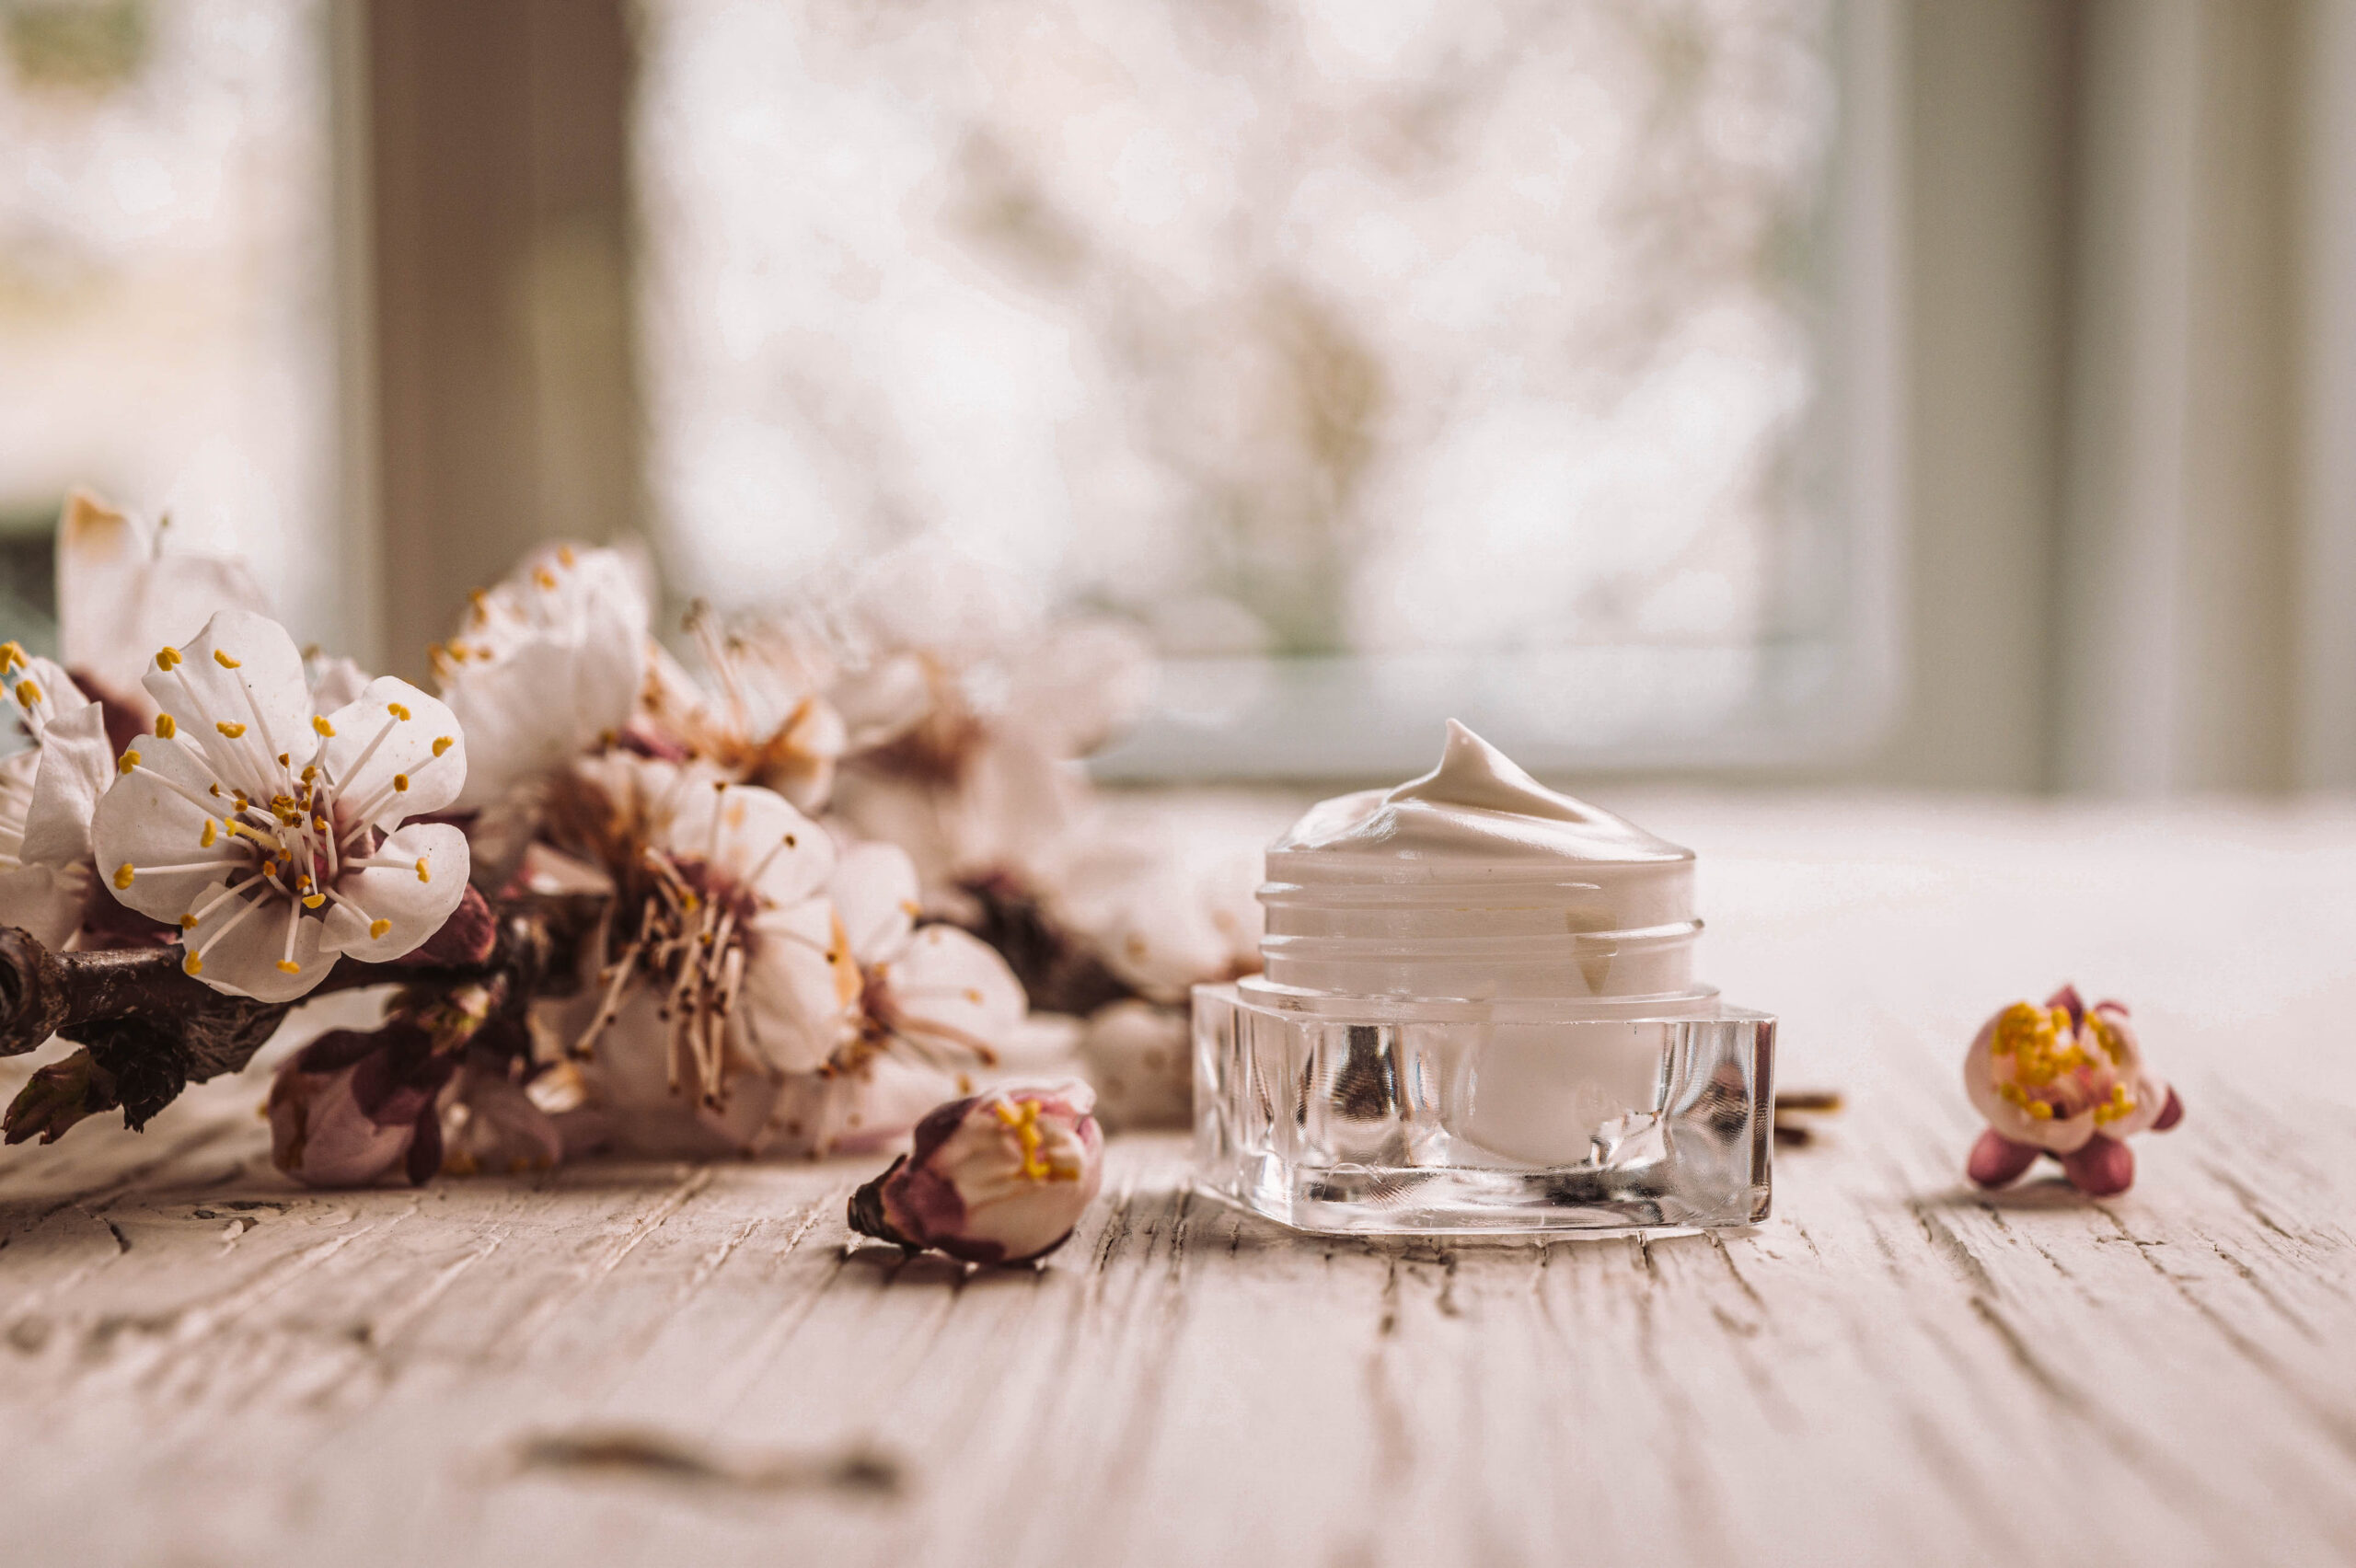 Kosmetik Albisrieden, Andrea Lehr, Vipfitstyle Beauty Perfect